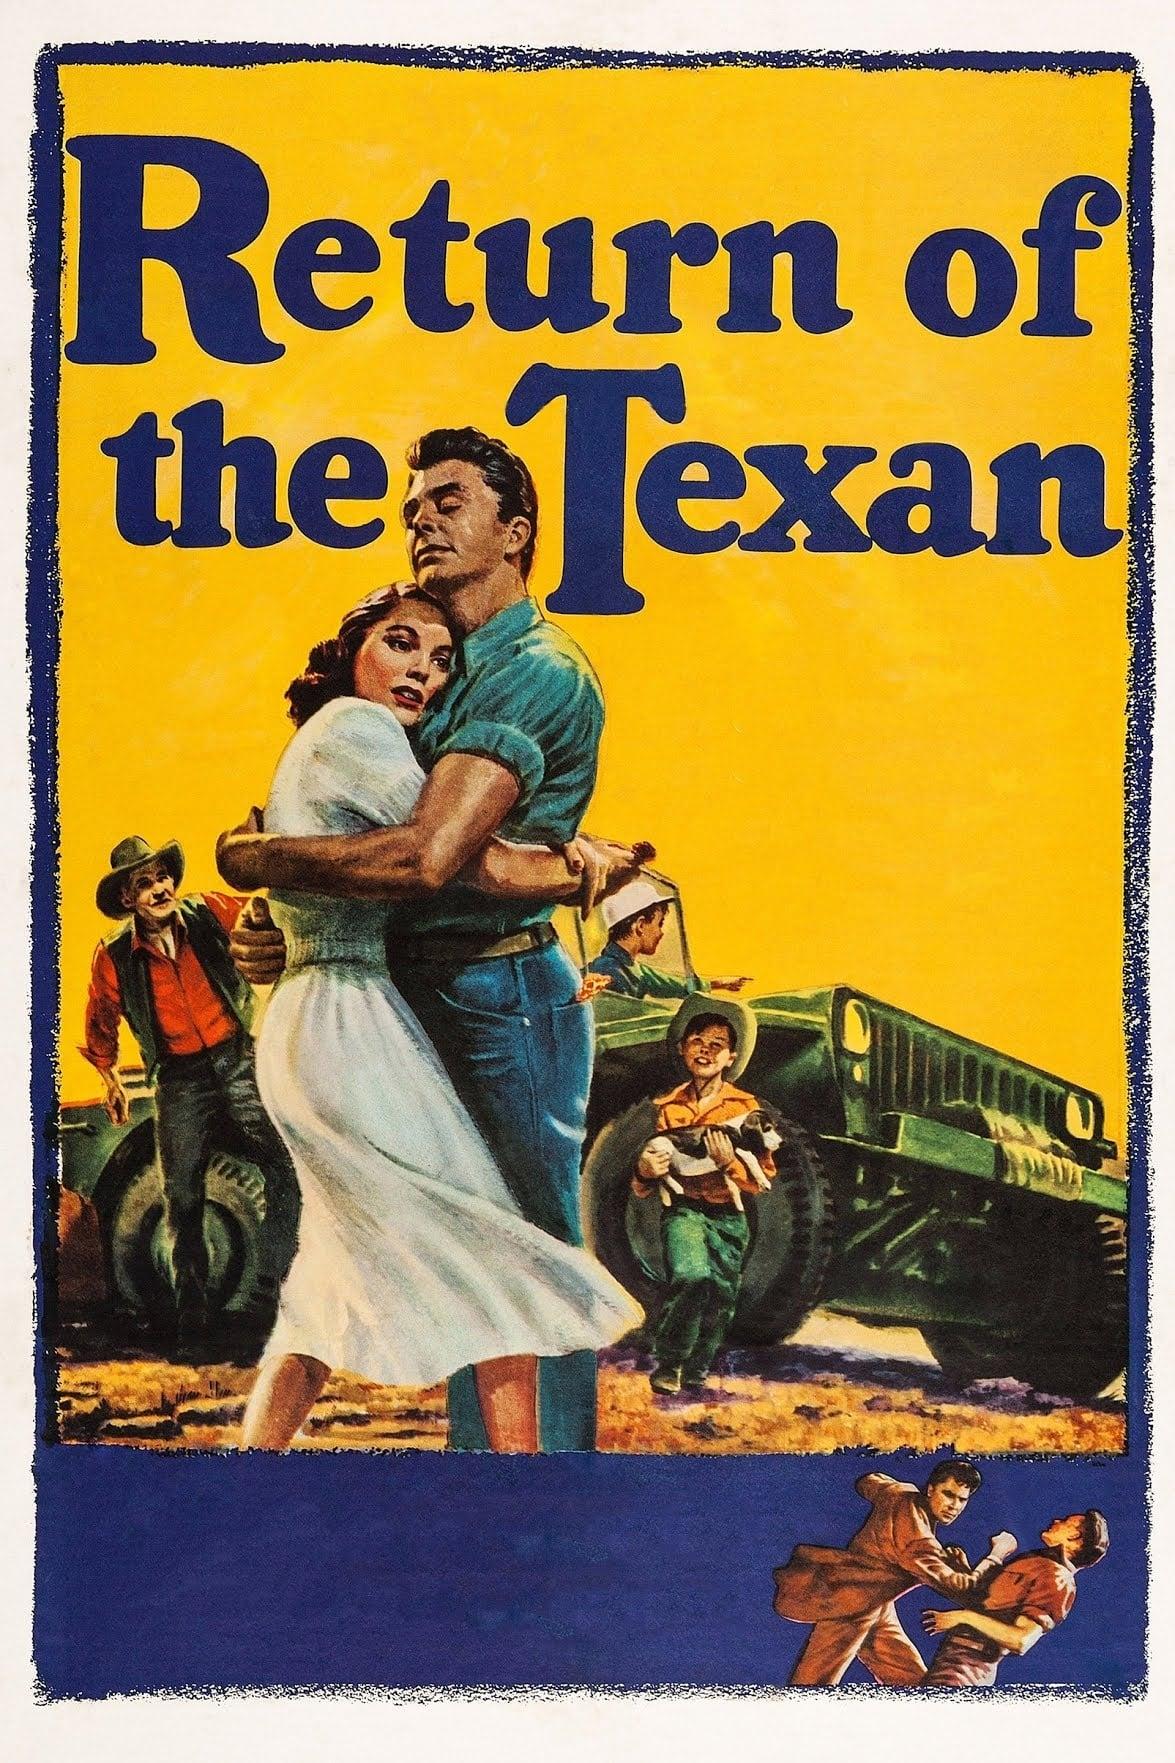 Return of the Texan